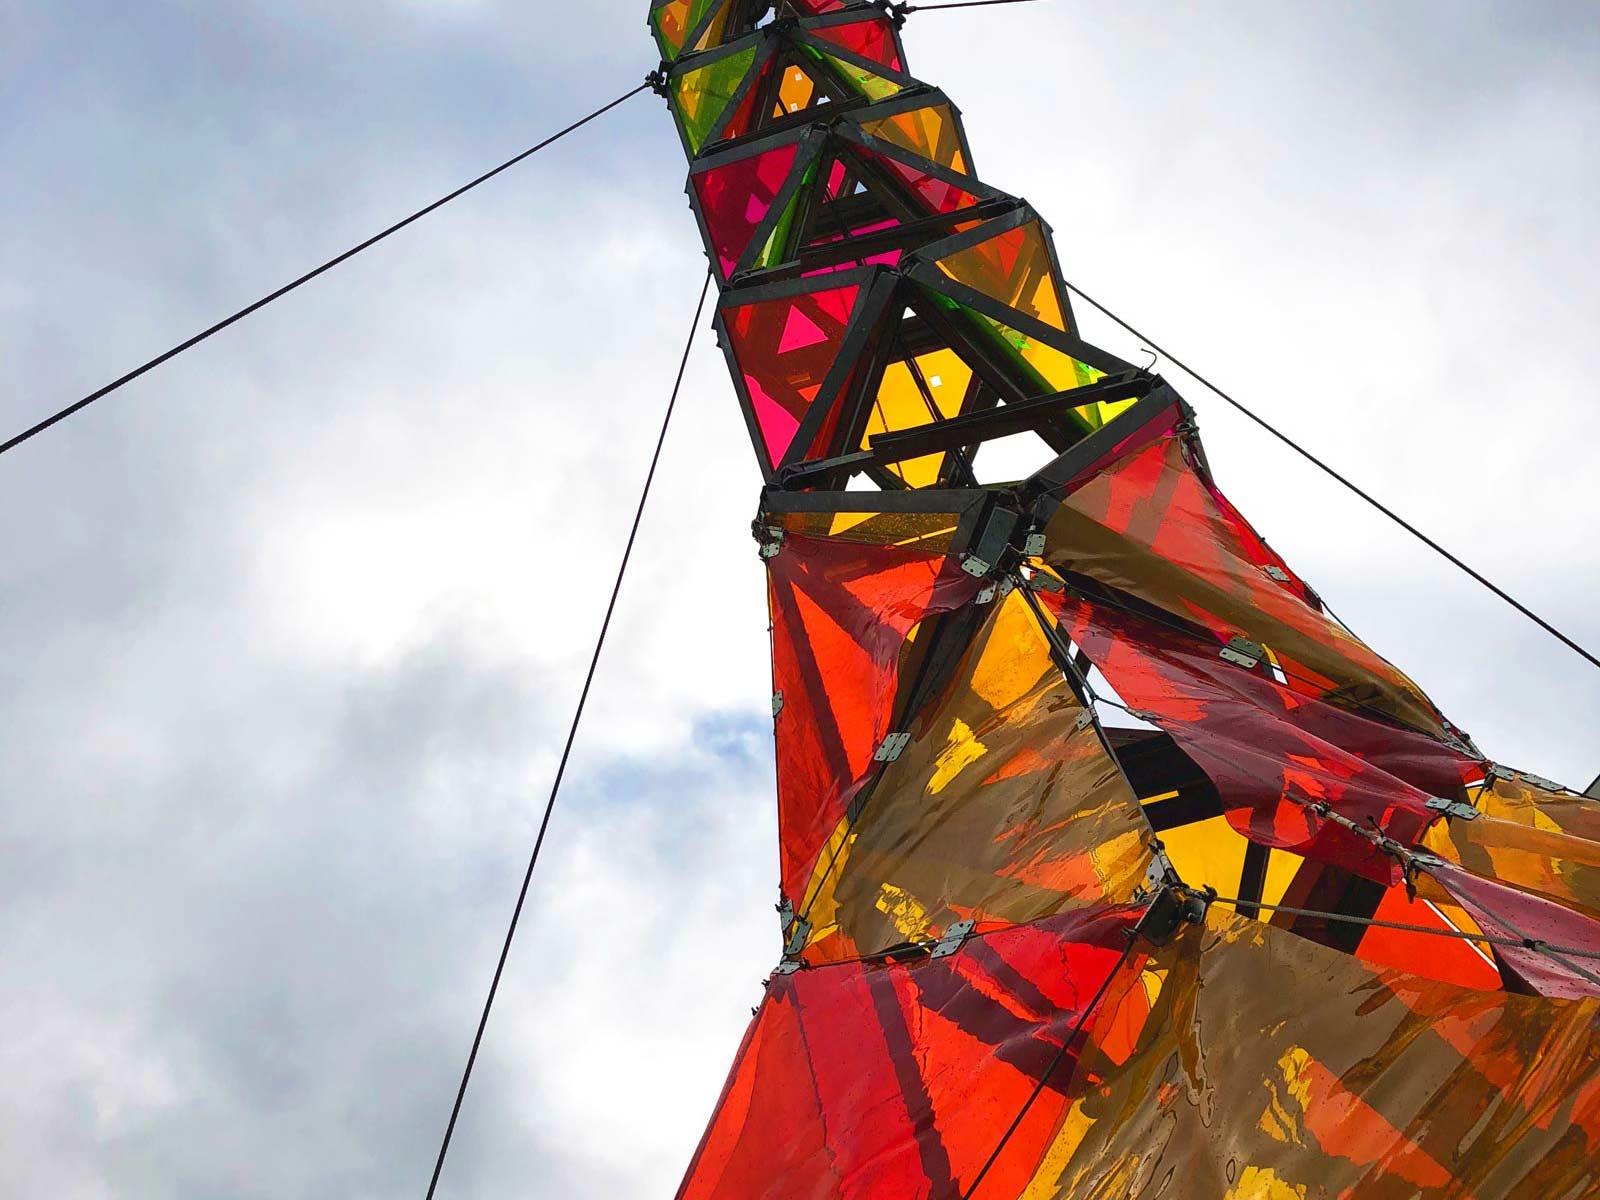 Stahlkonstruktion mit bunten Kunststofffolien